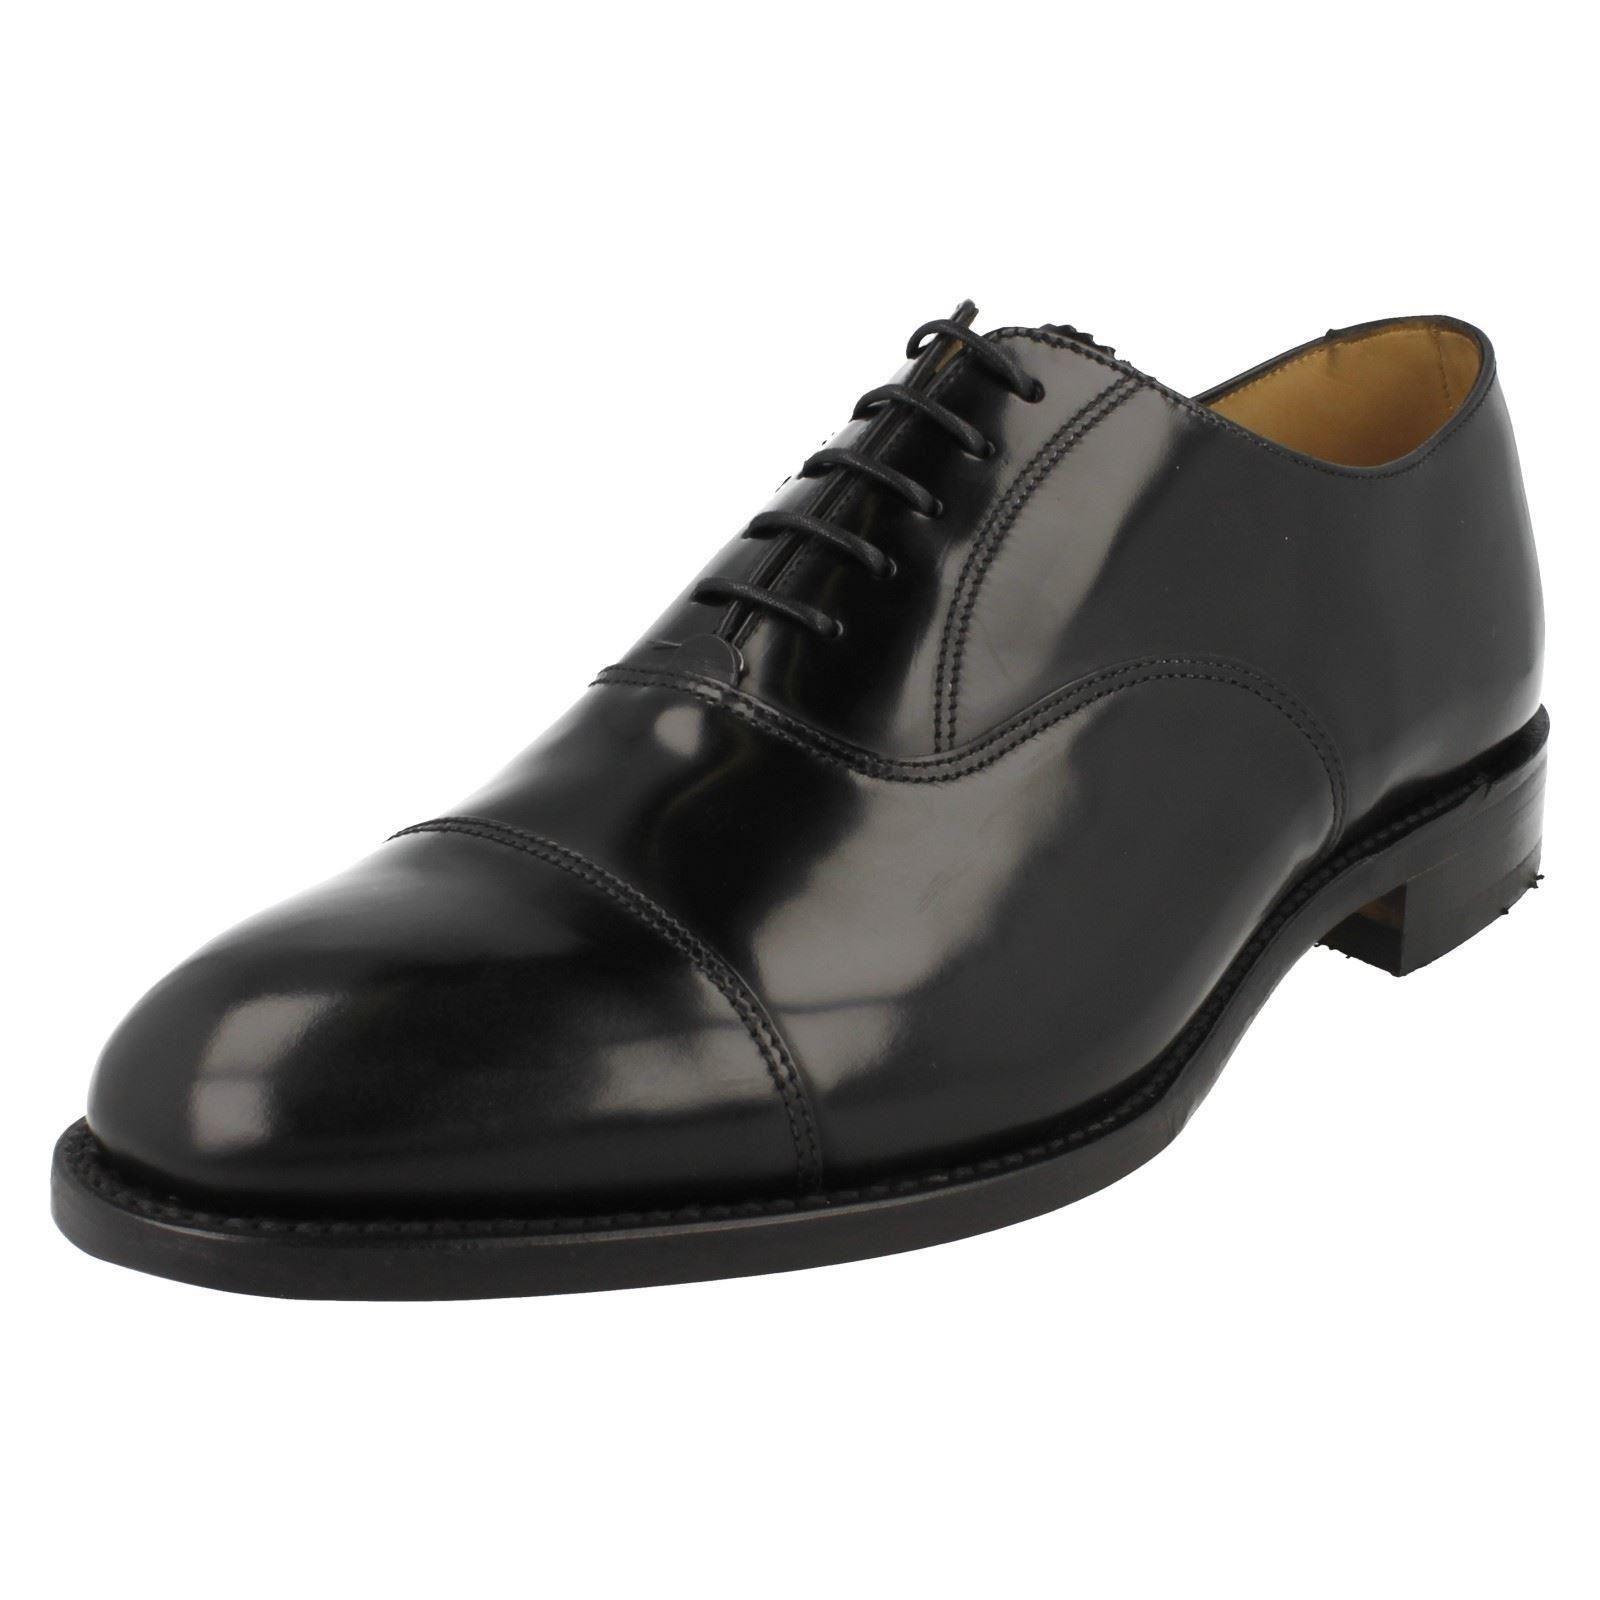 Mens Loake schwarz Style Formal Schuhes Style schwarz - 747B 8b01df